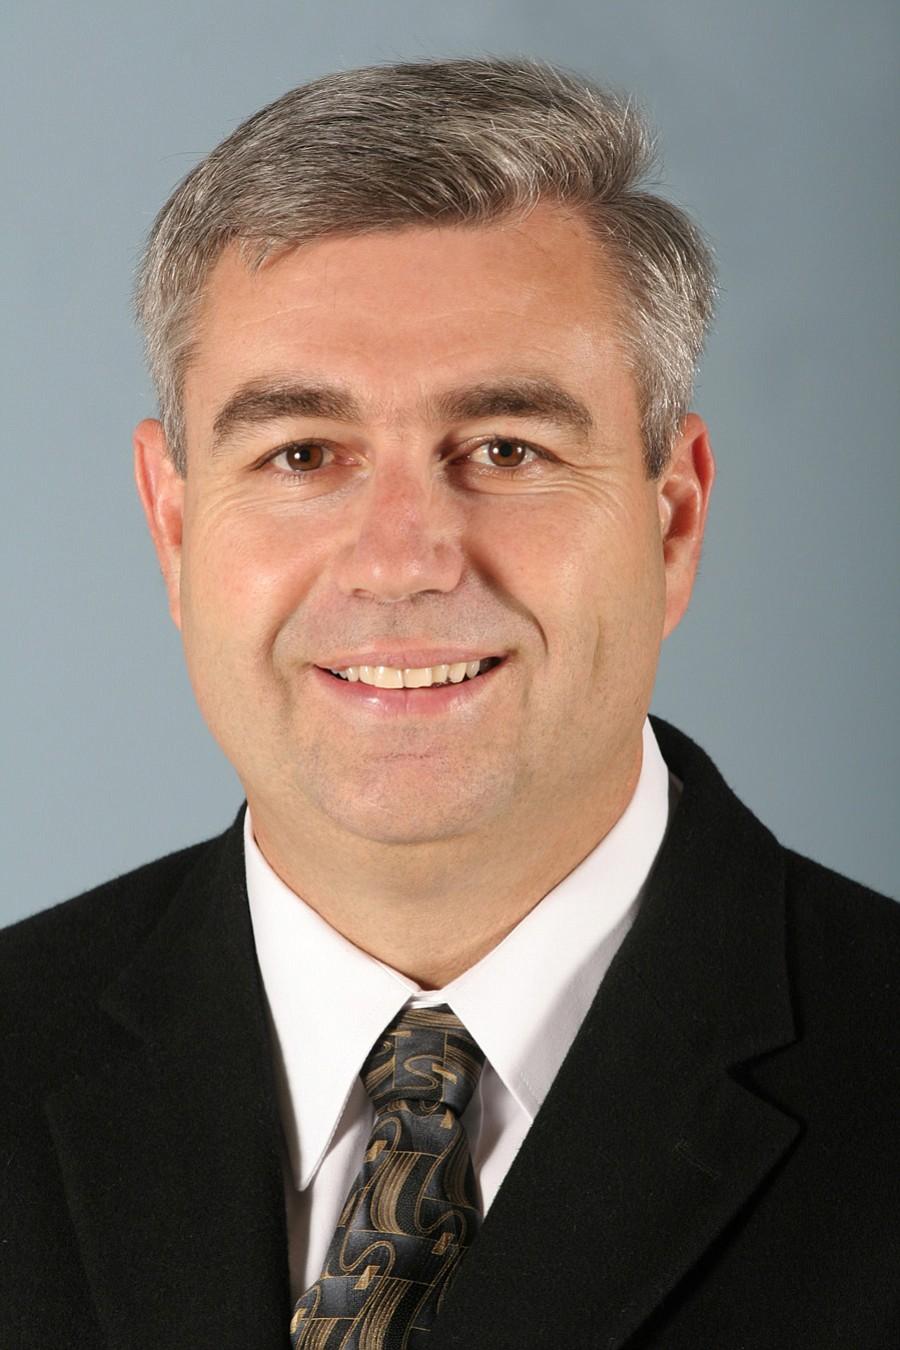 Robert Knight, president of Clark College